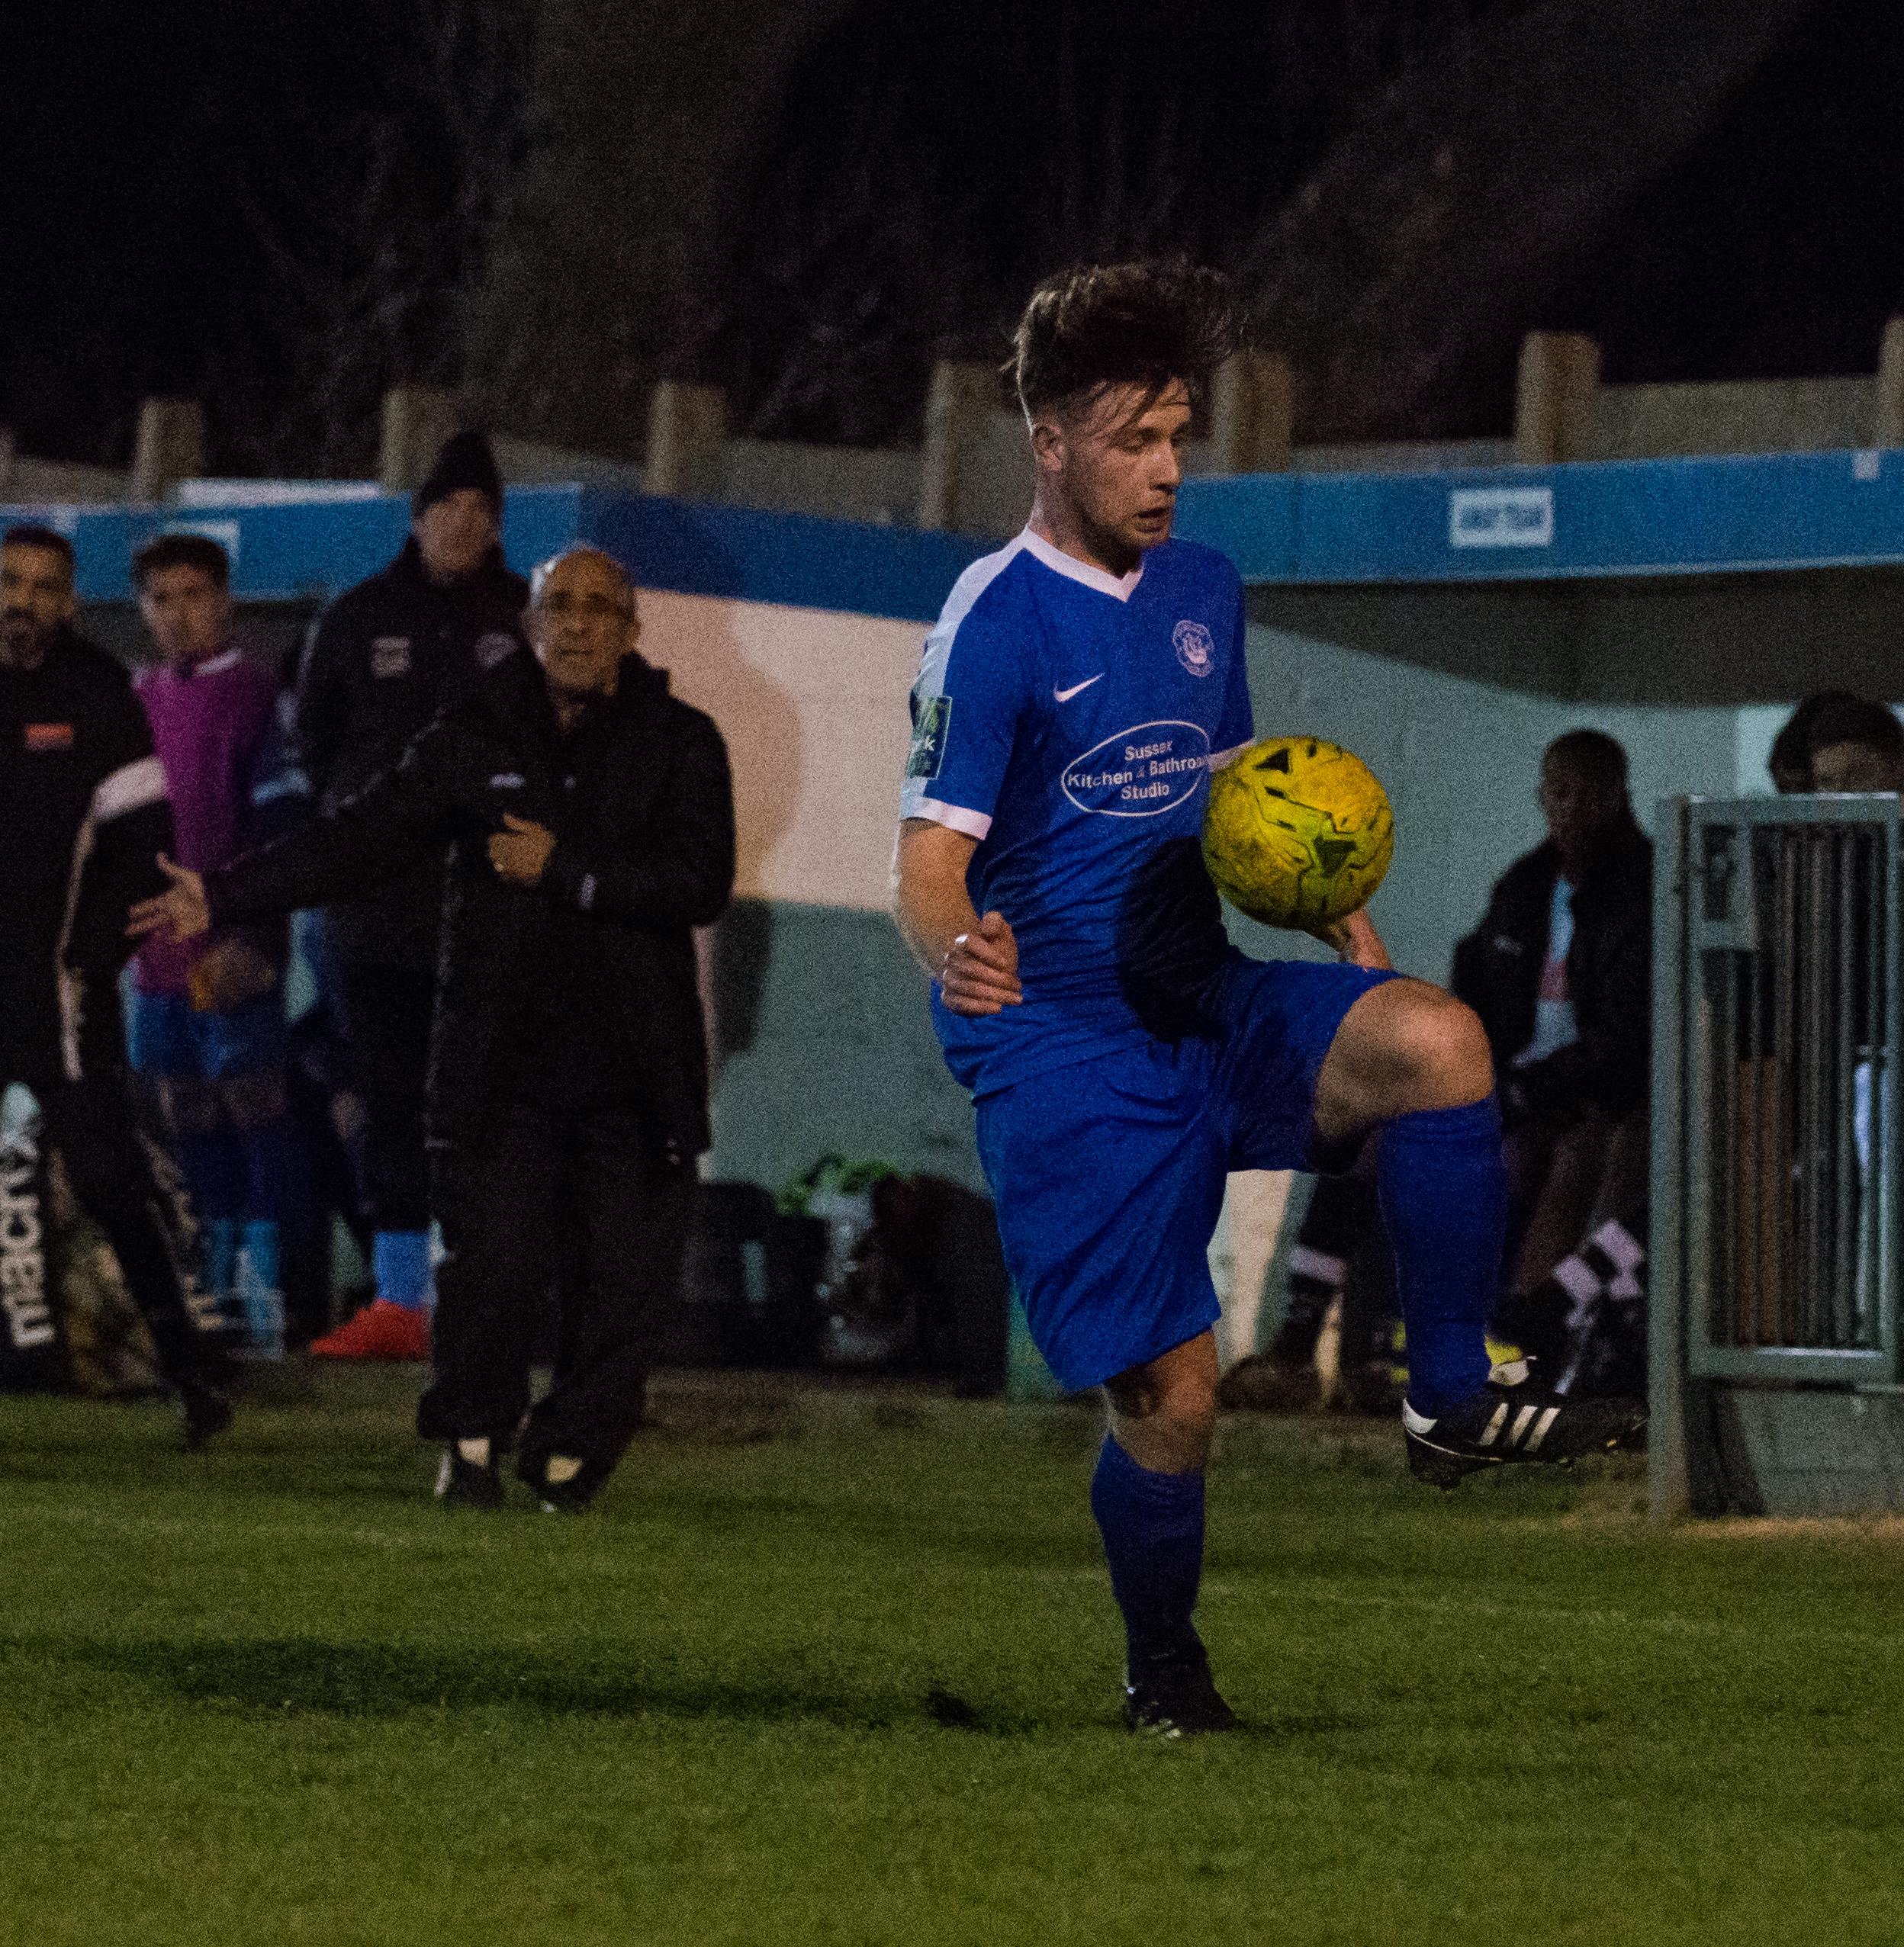 Shoreham FC vs Molesey FC 02.12.17 104